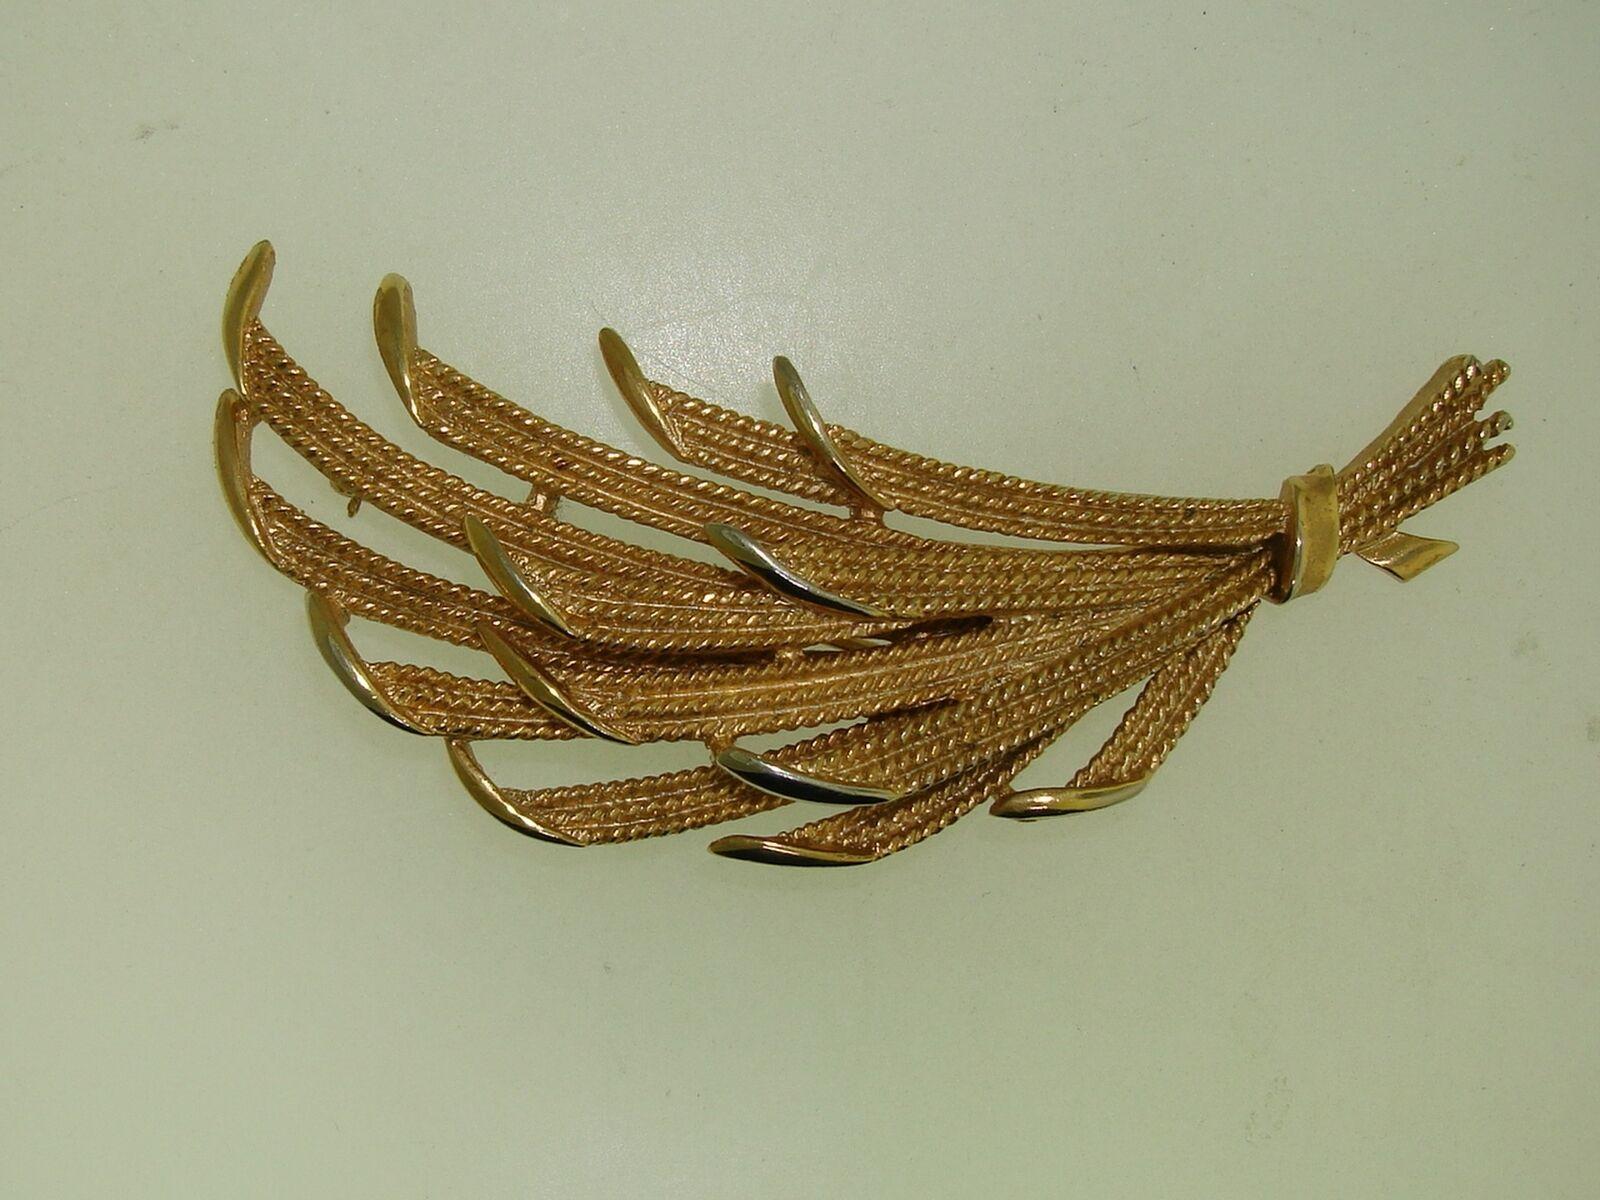 Lovely Vintage Crown Trifari Silver Tone Leaf Design Brooch and Clip-on Earrings Set Vintage Designer Jewelry Set